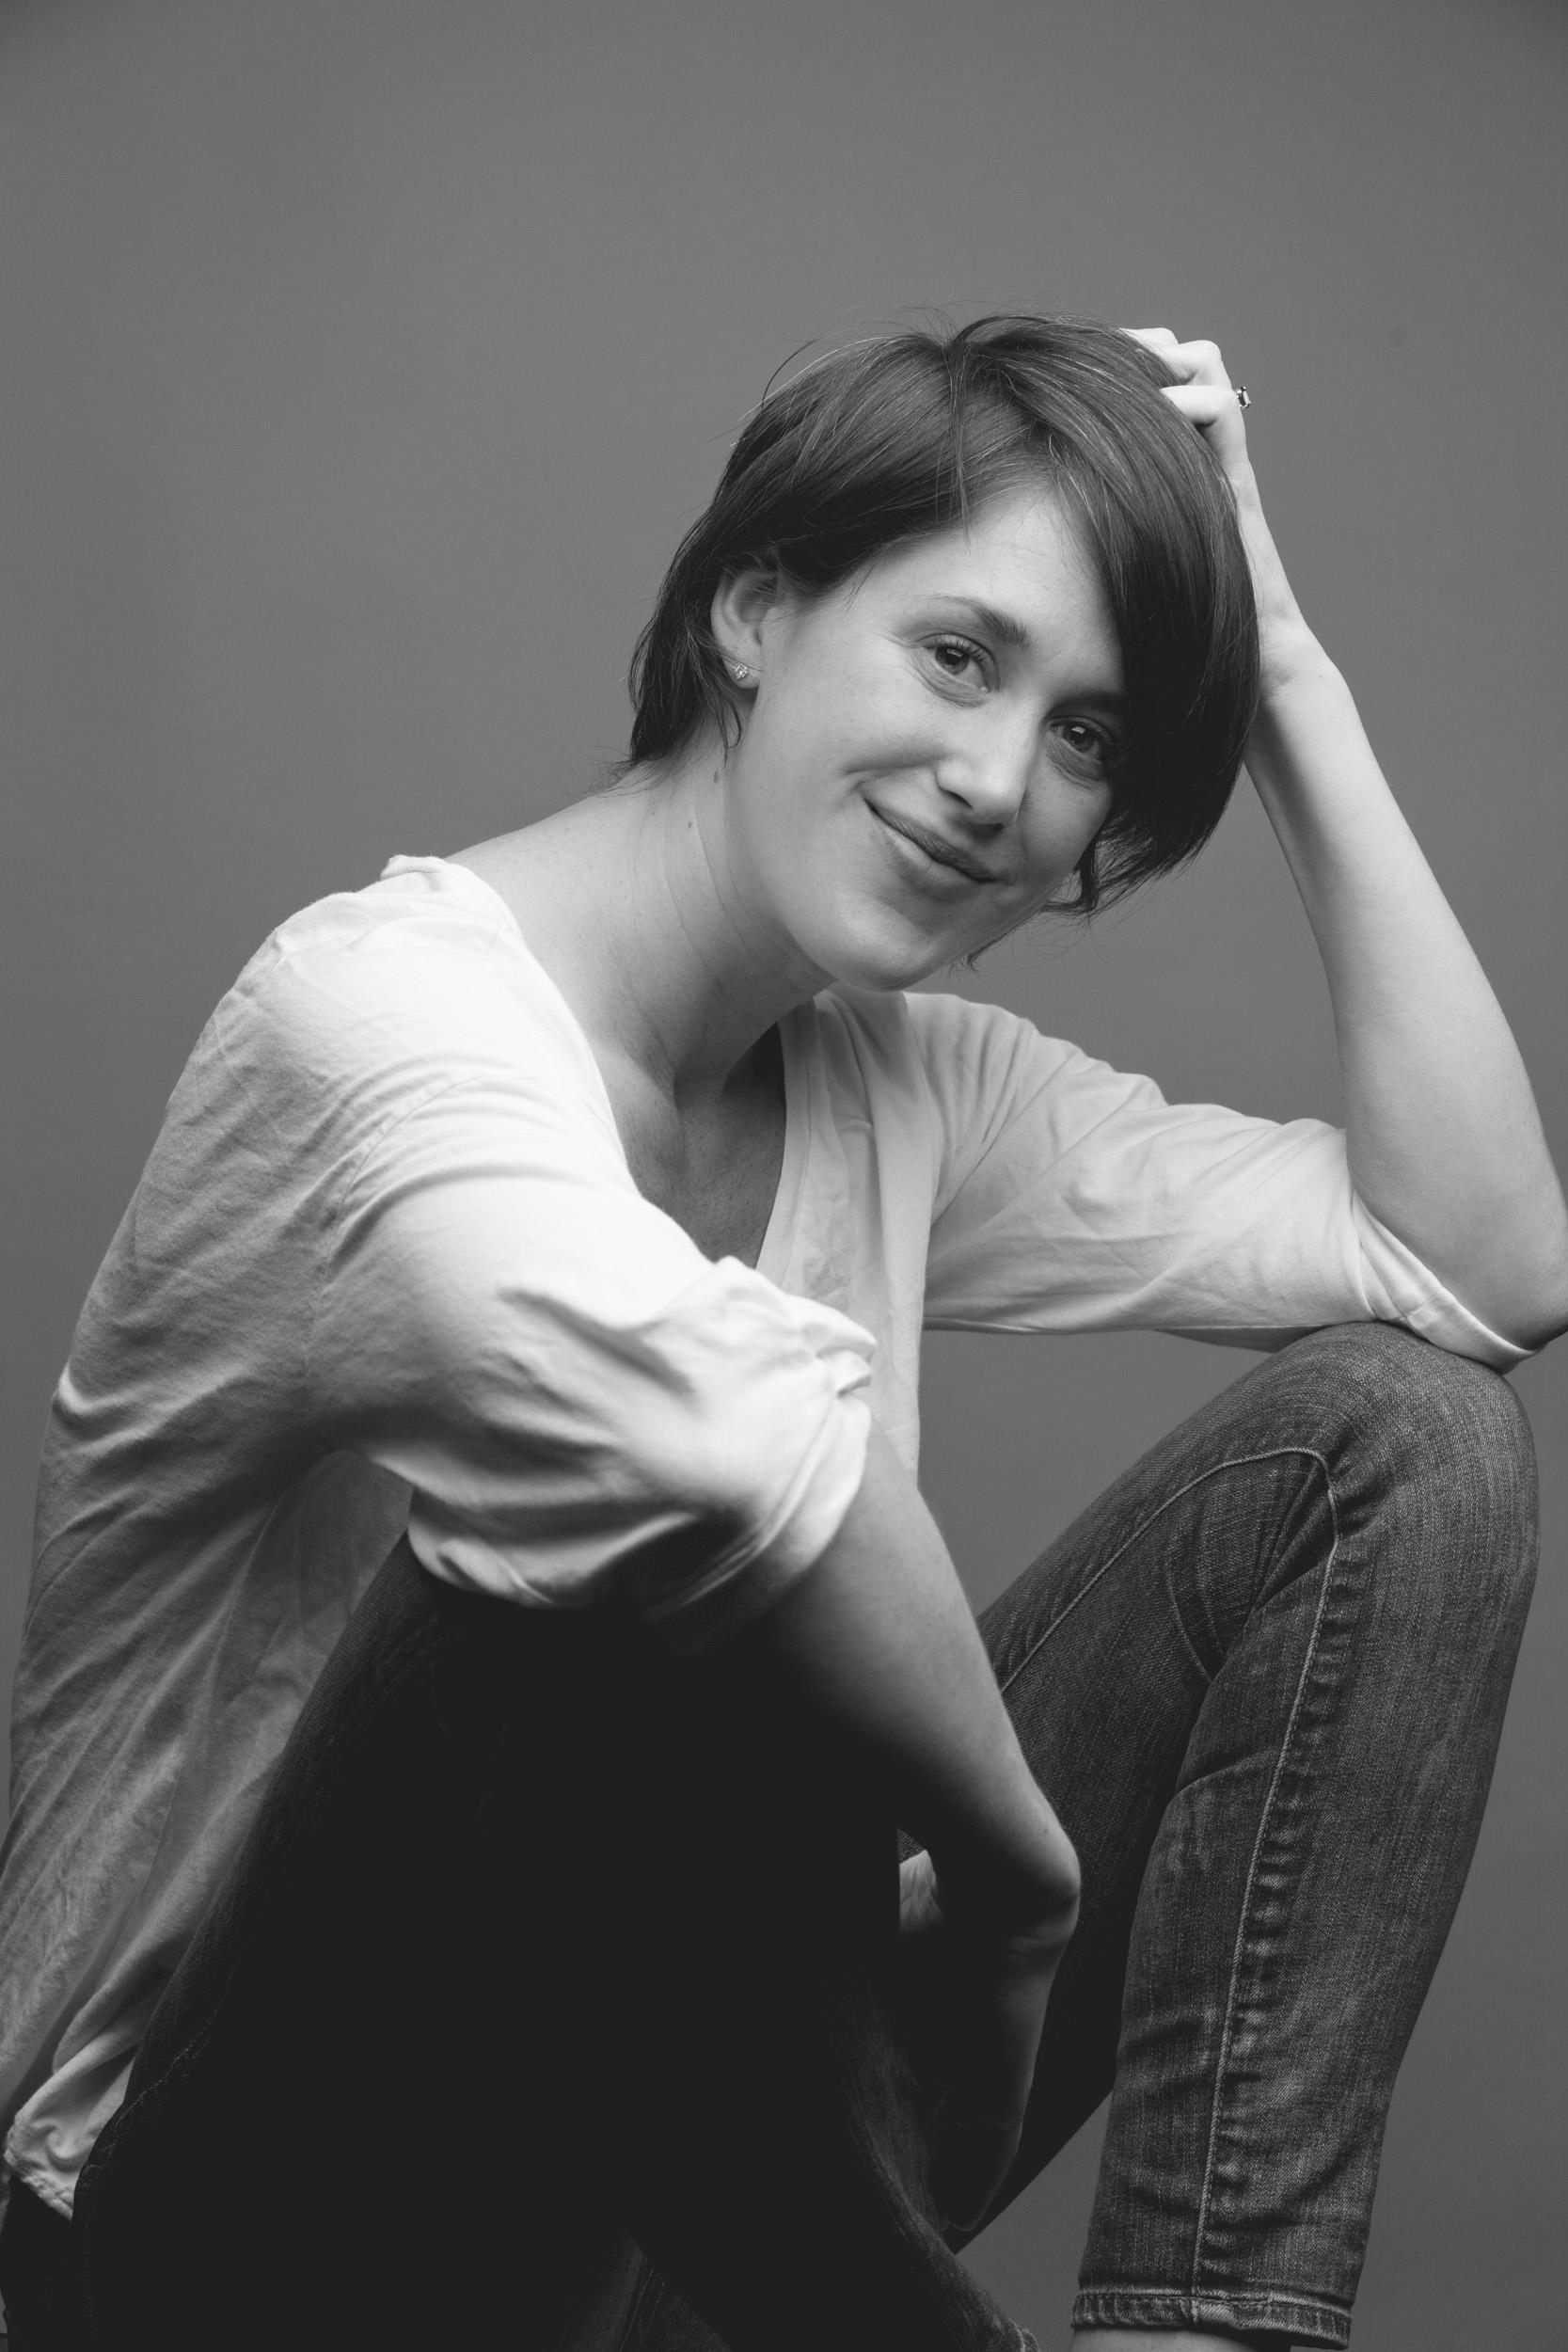 29Henrikson-Rachel Hulin Tether012.JPG